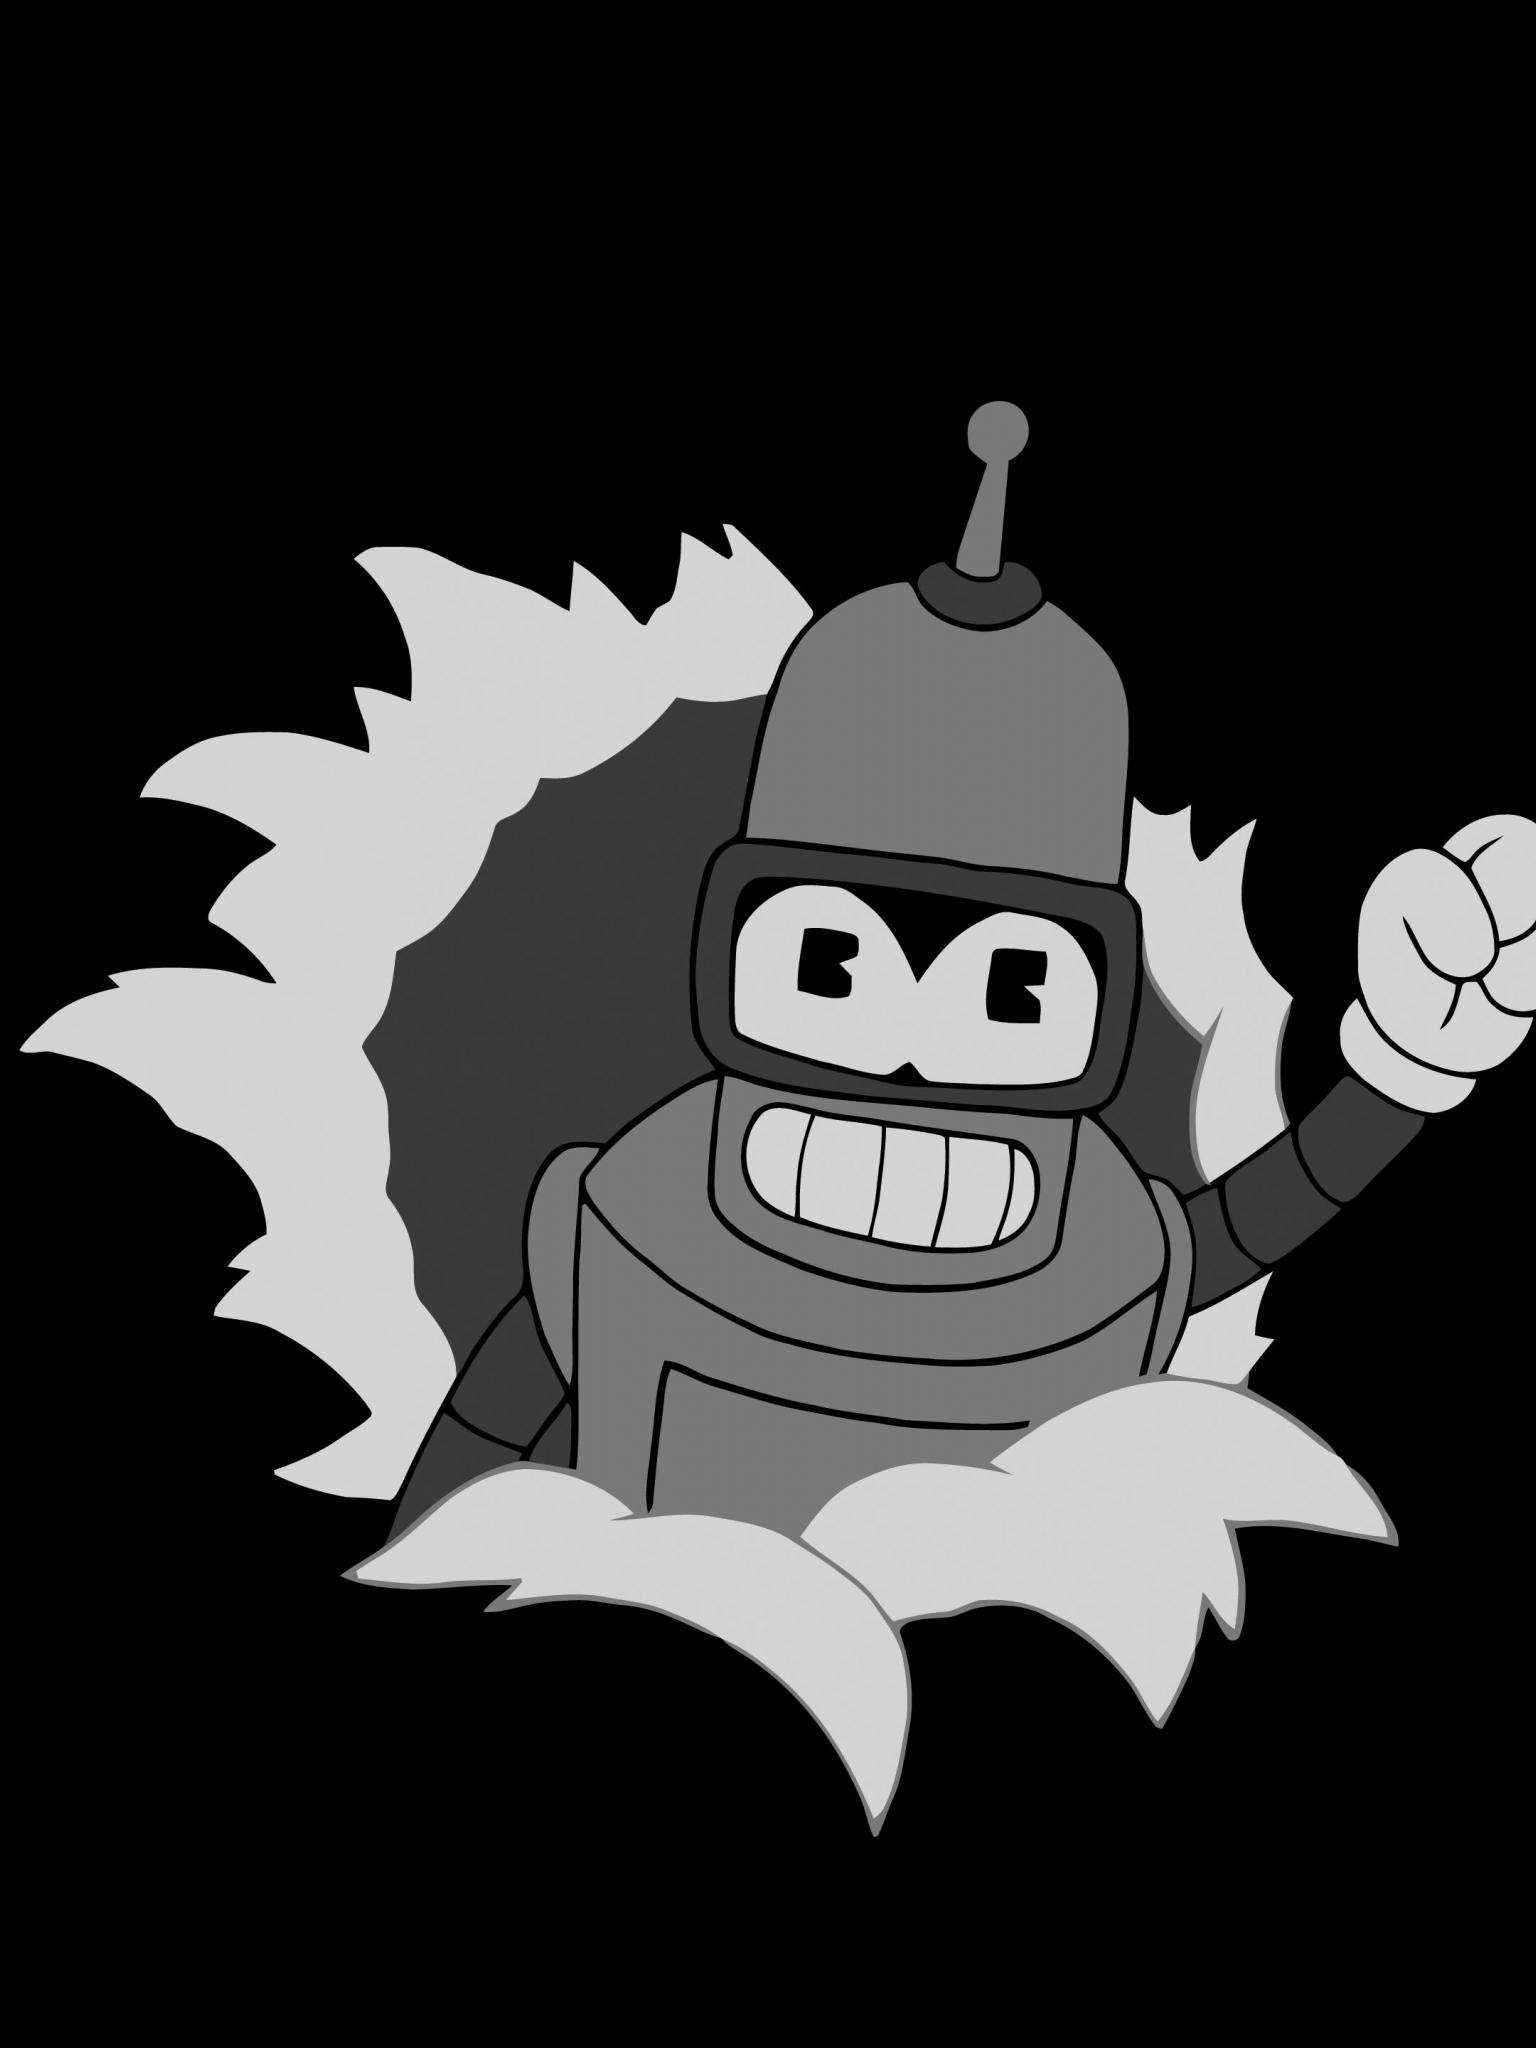 Bender Futurama Wallpaper [5120x2880